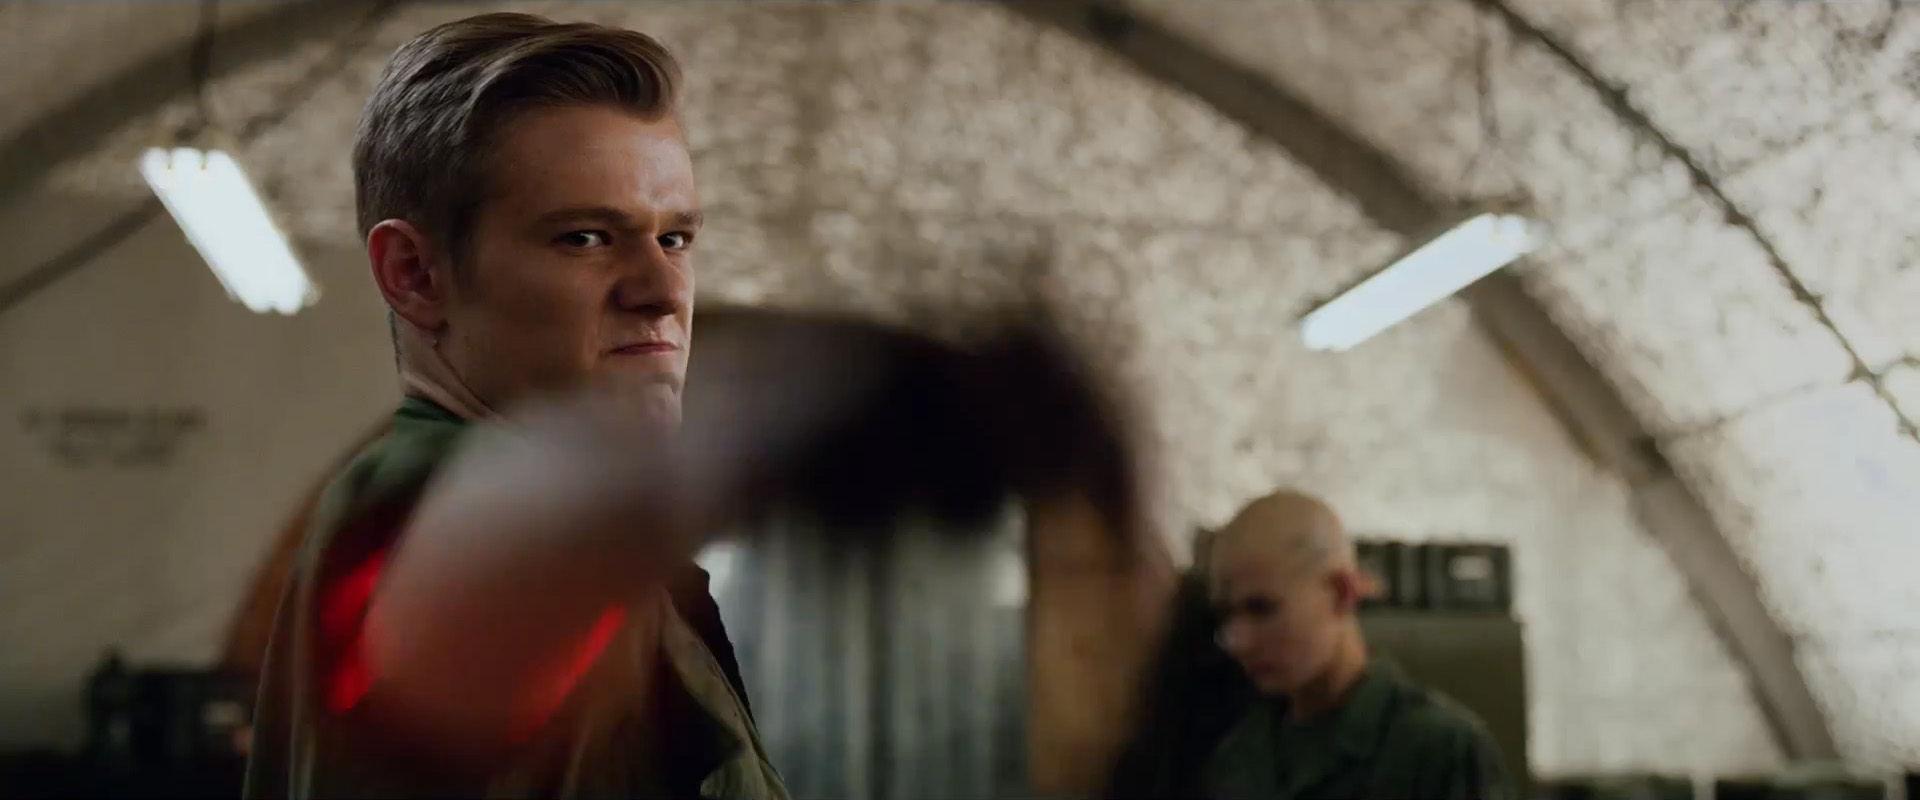 What Does Havok's Return Mean For X-Men Apocalypse ...